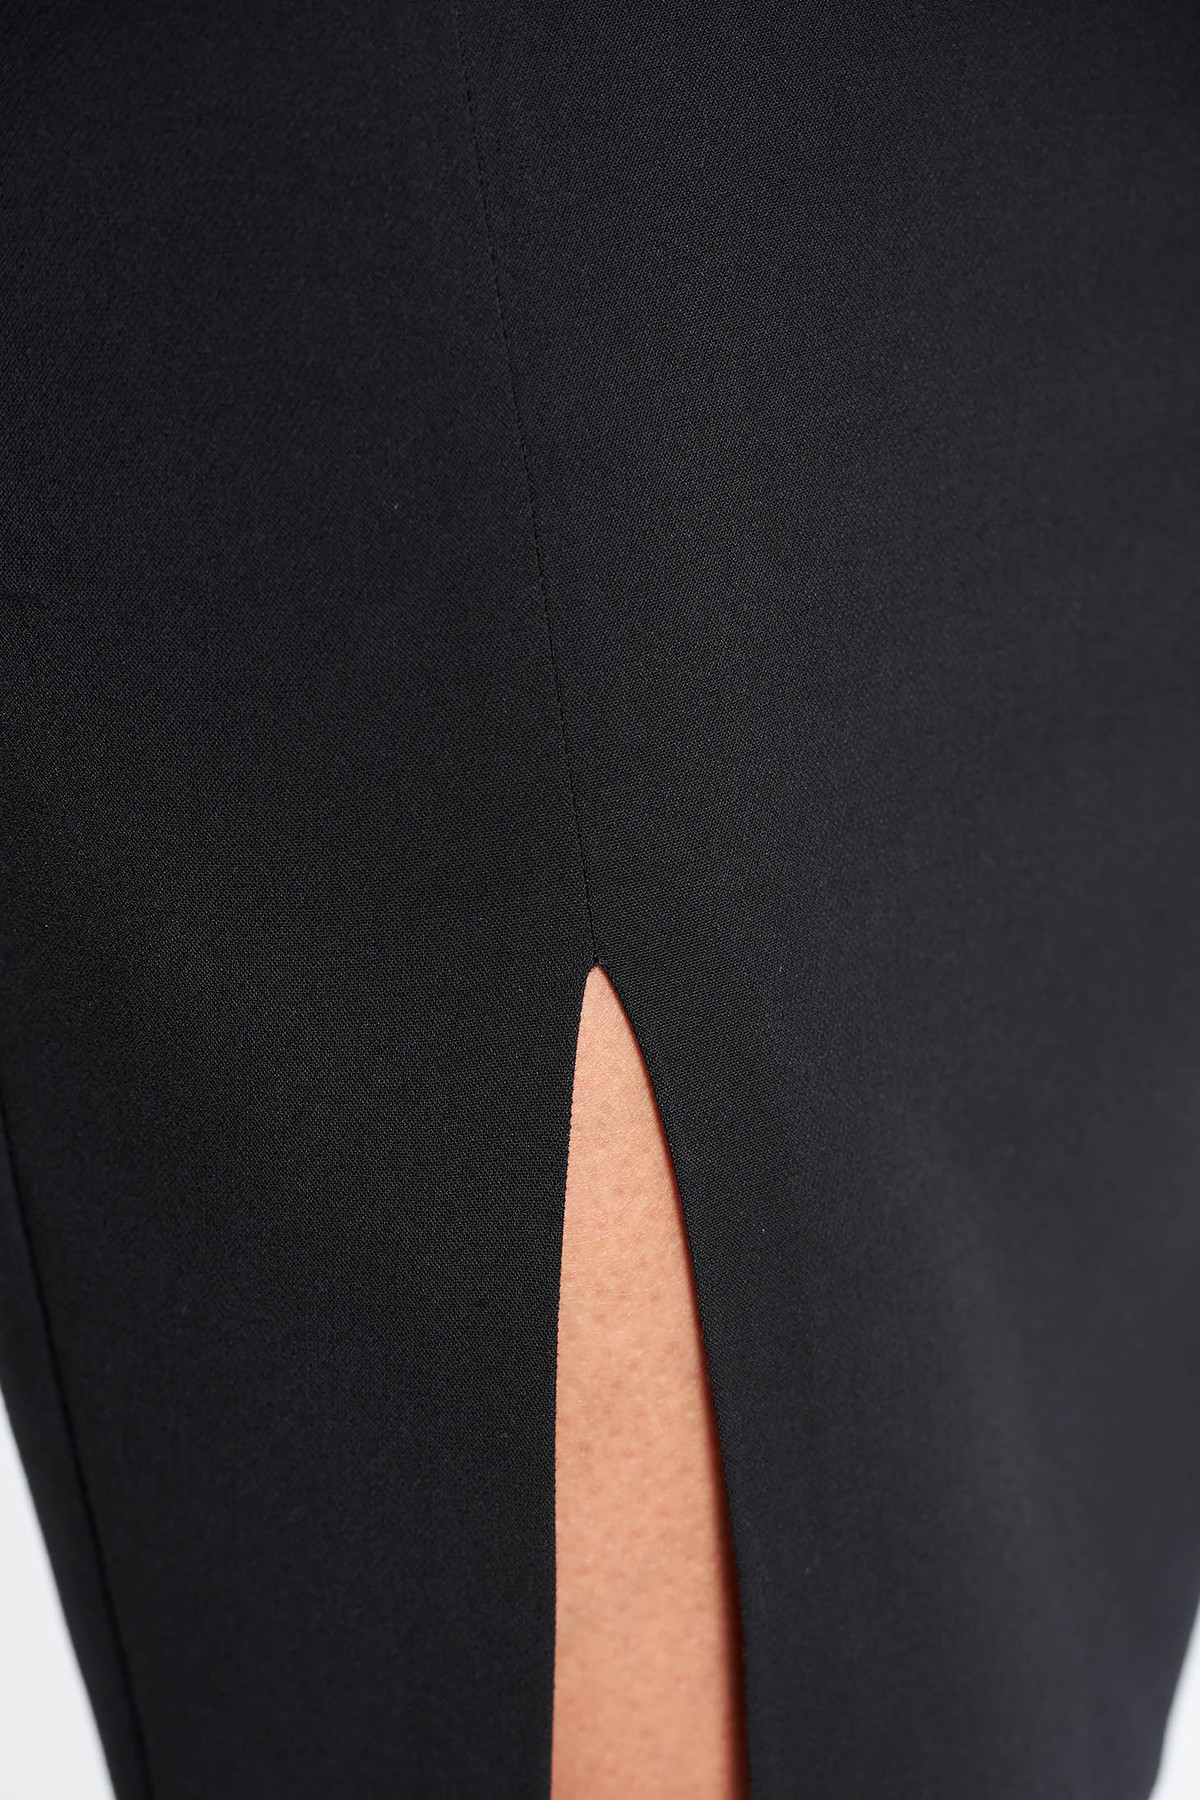 Fusta LaDonna neagra office din stofa usor elastica captusita pe interior